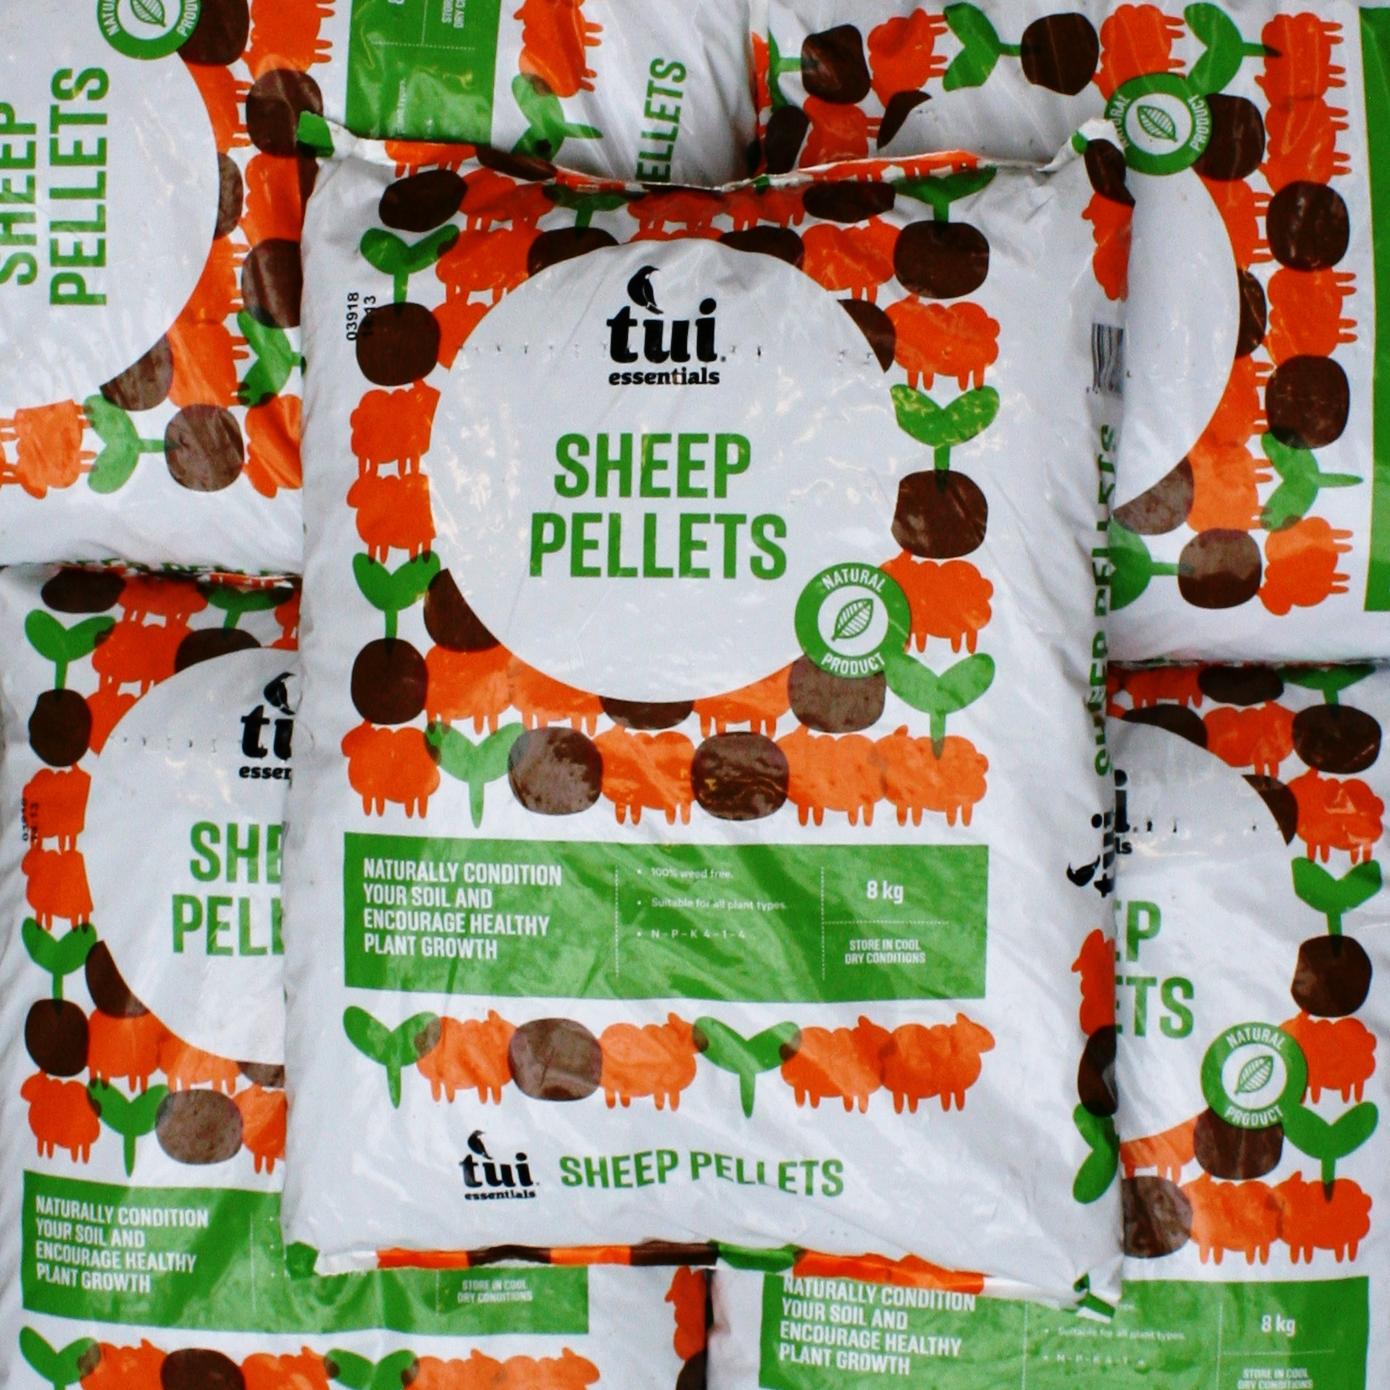 Tui Sheep Pellets 8kg2 for $26 -